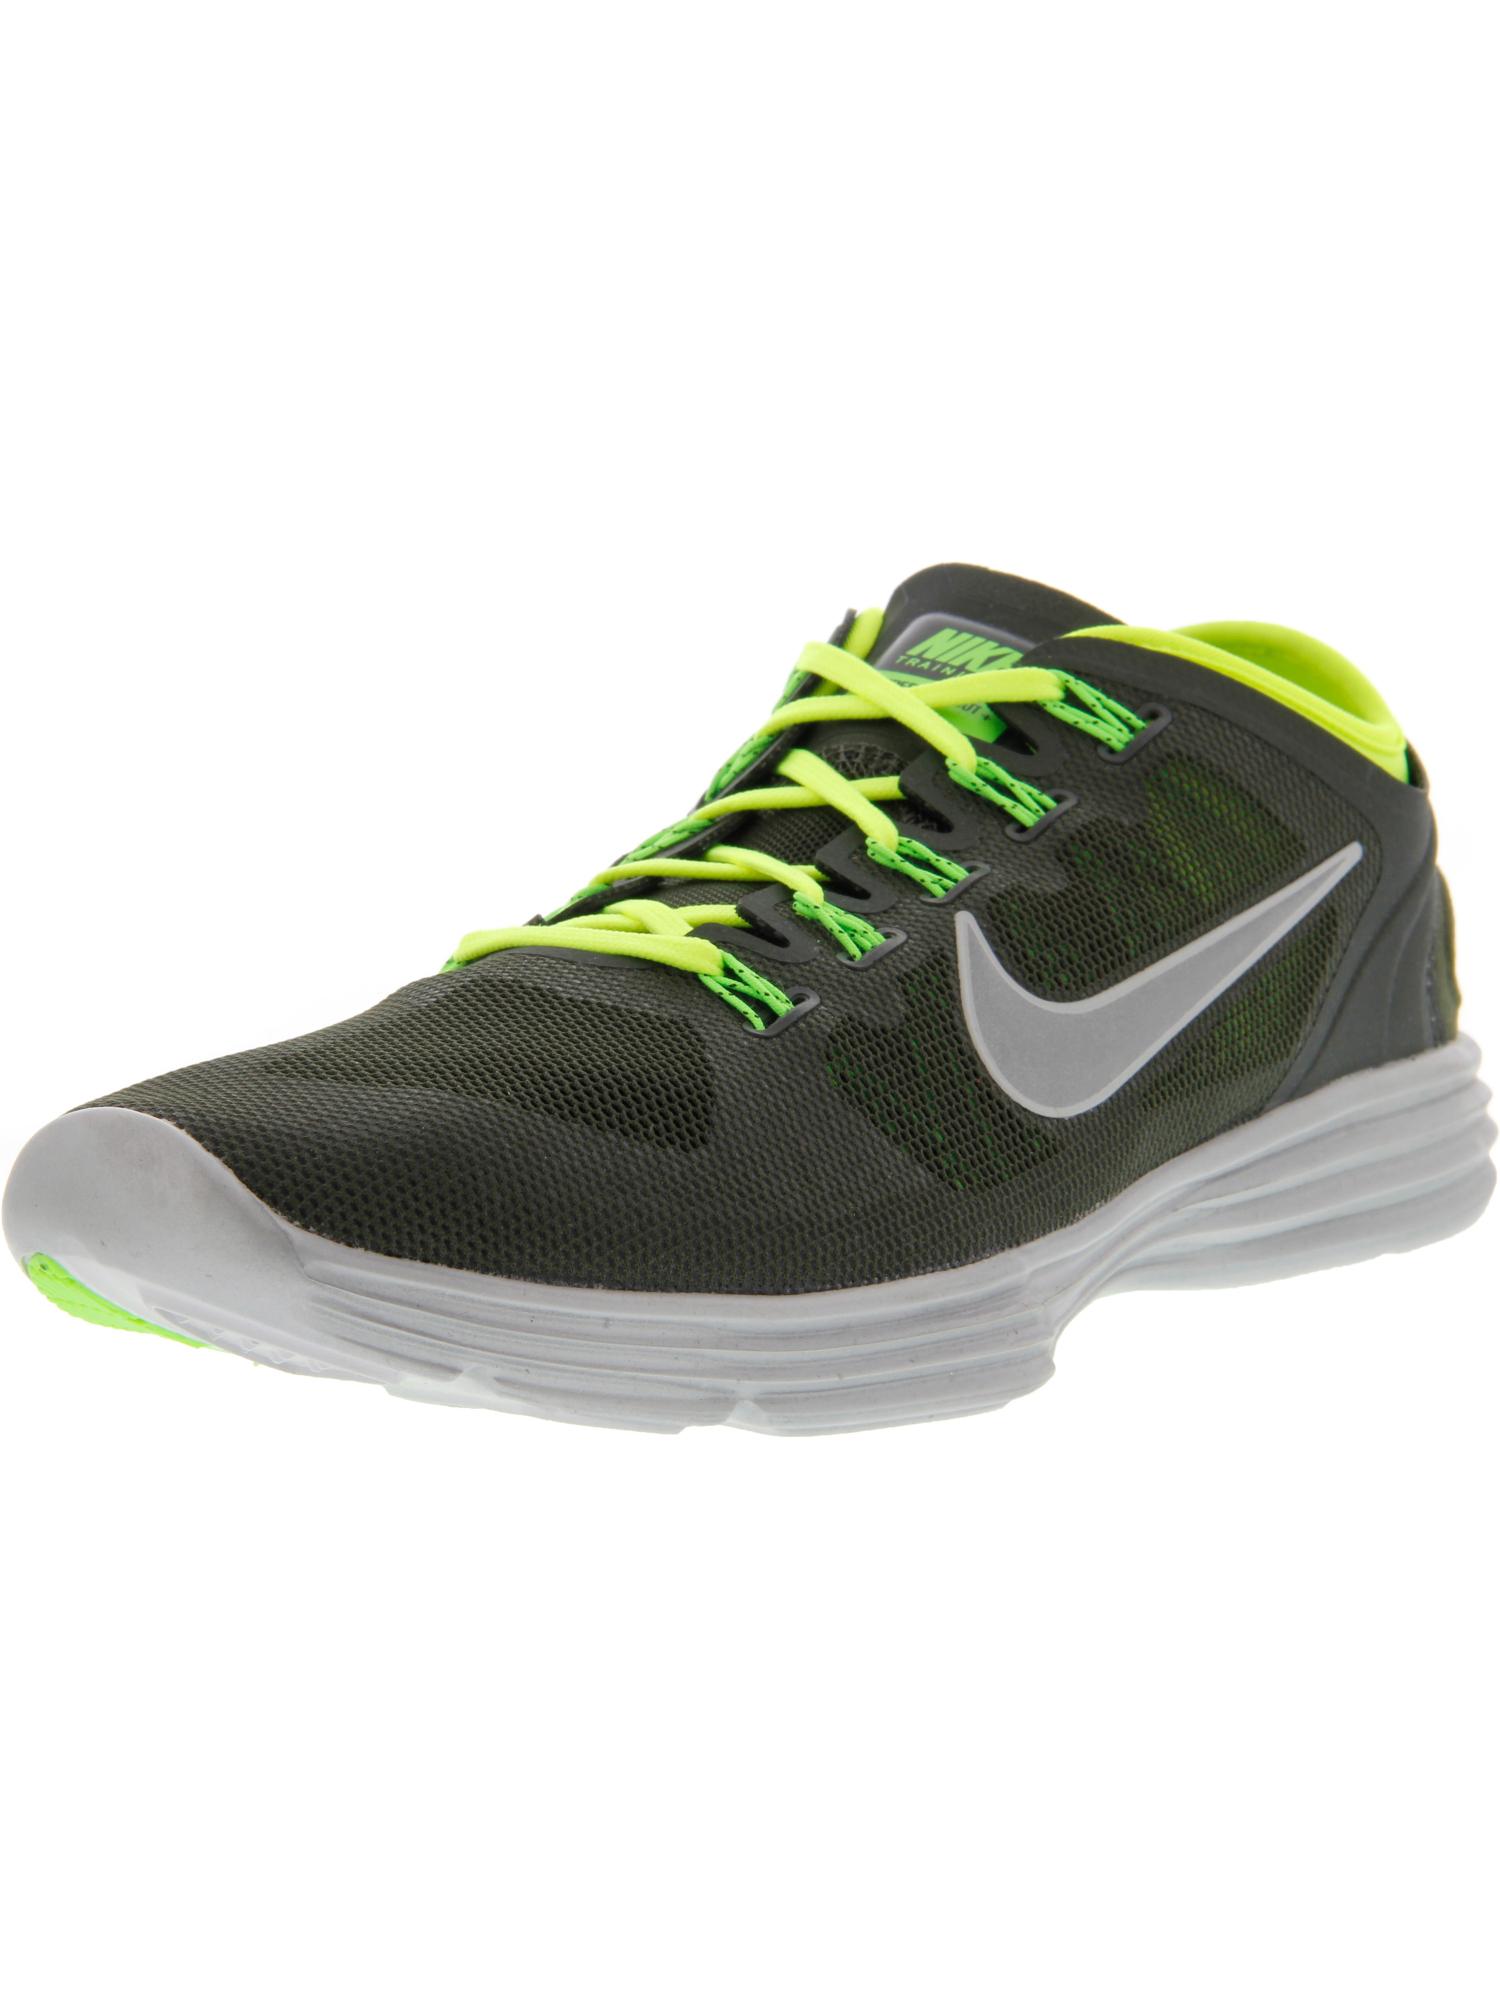 Nike Women's Women's Women's Lunarhyperworkout Xt+ Ankle-High Training shoes d0fa76